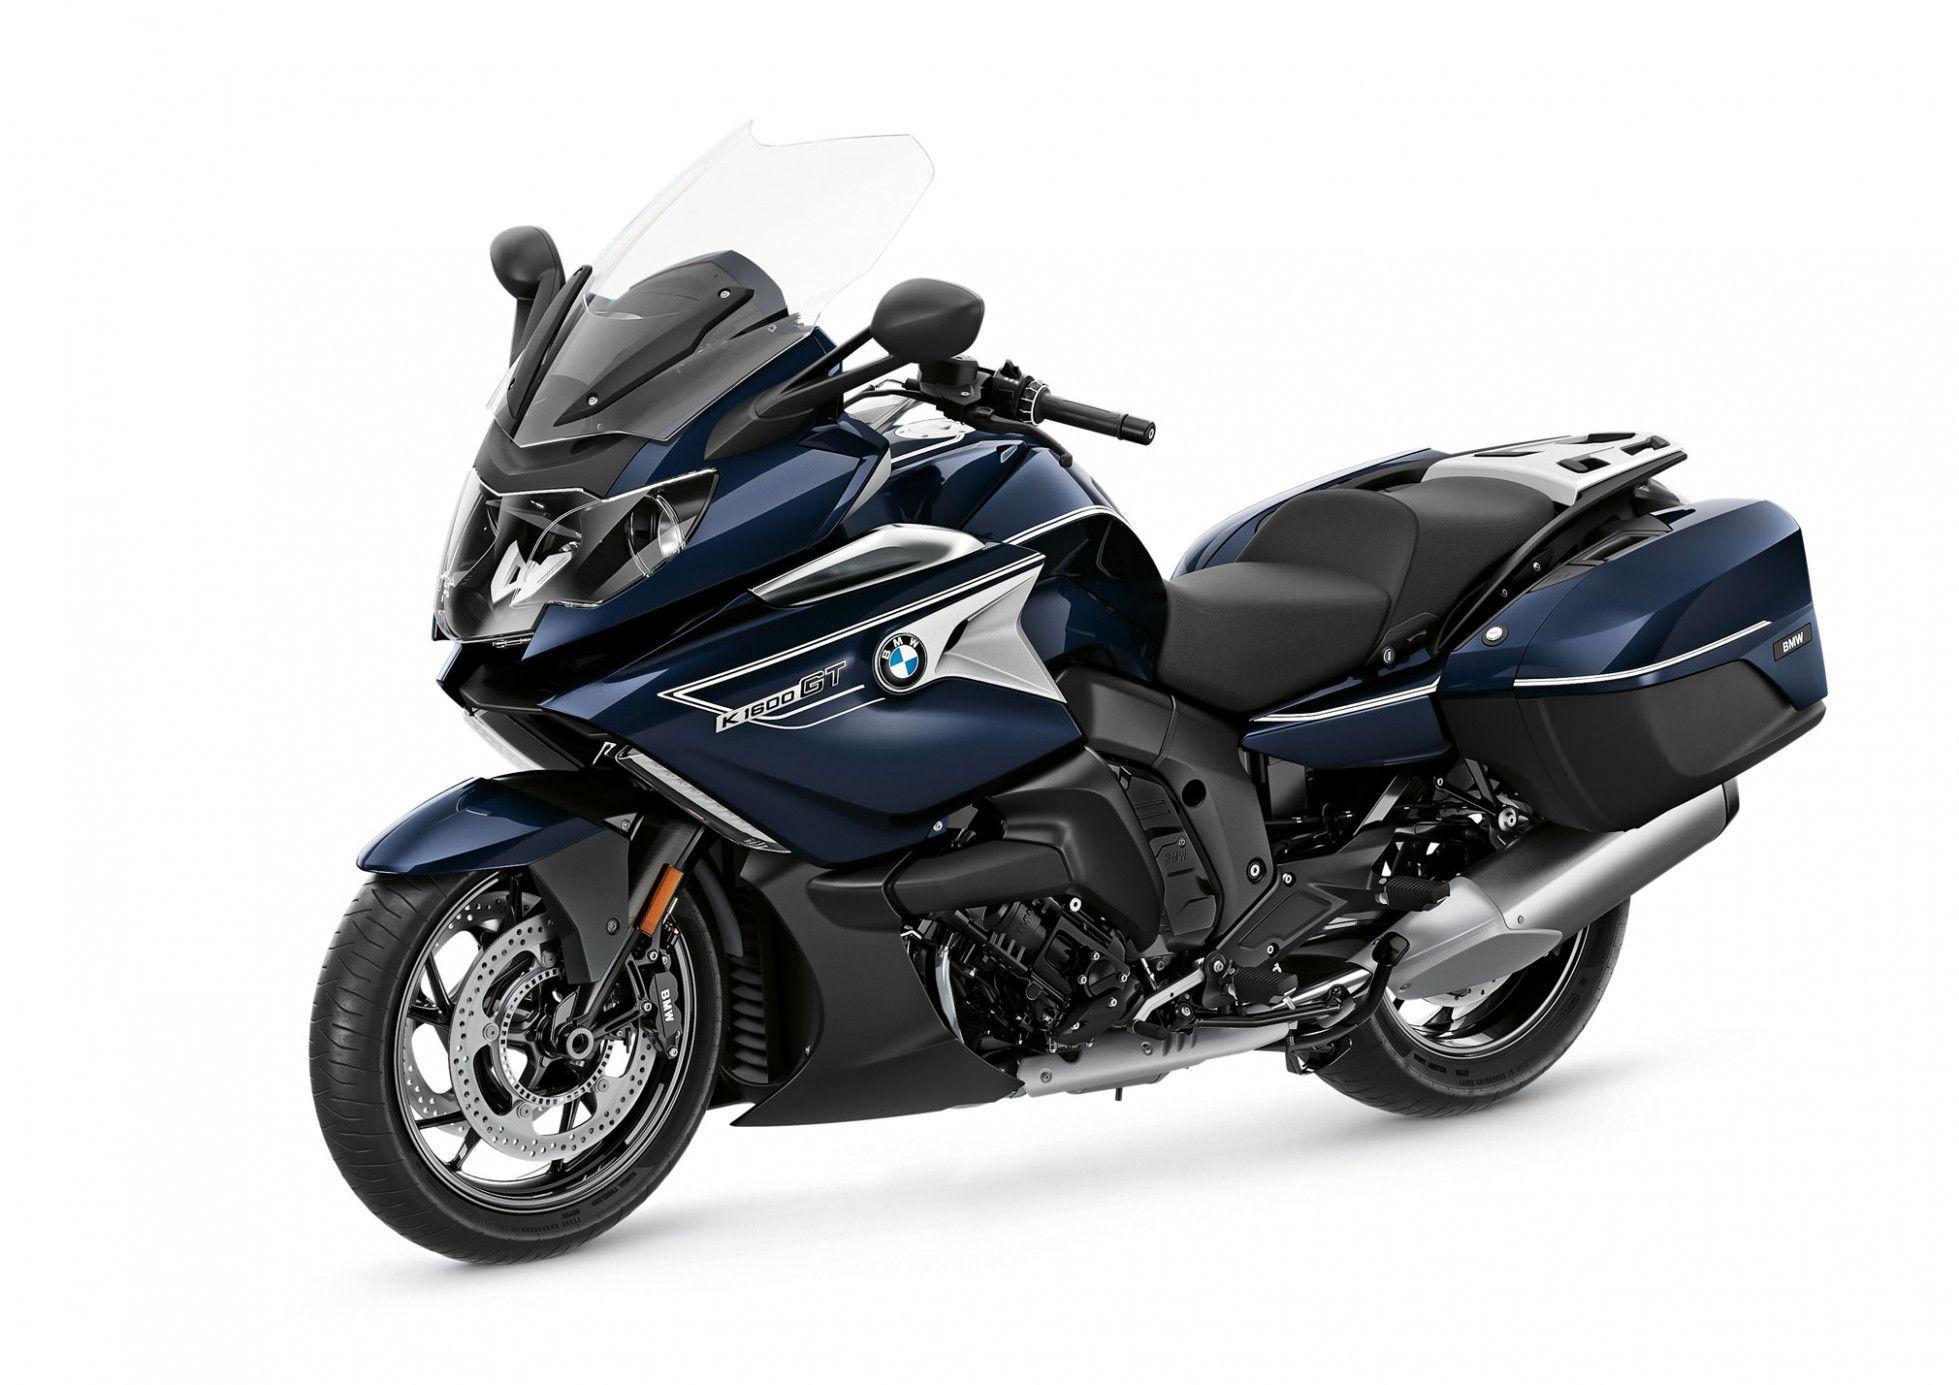 2020 Bmw Gtl 1600 In 2020 Bmw Bmw Motorcycles New Cars